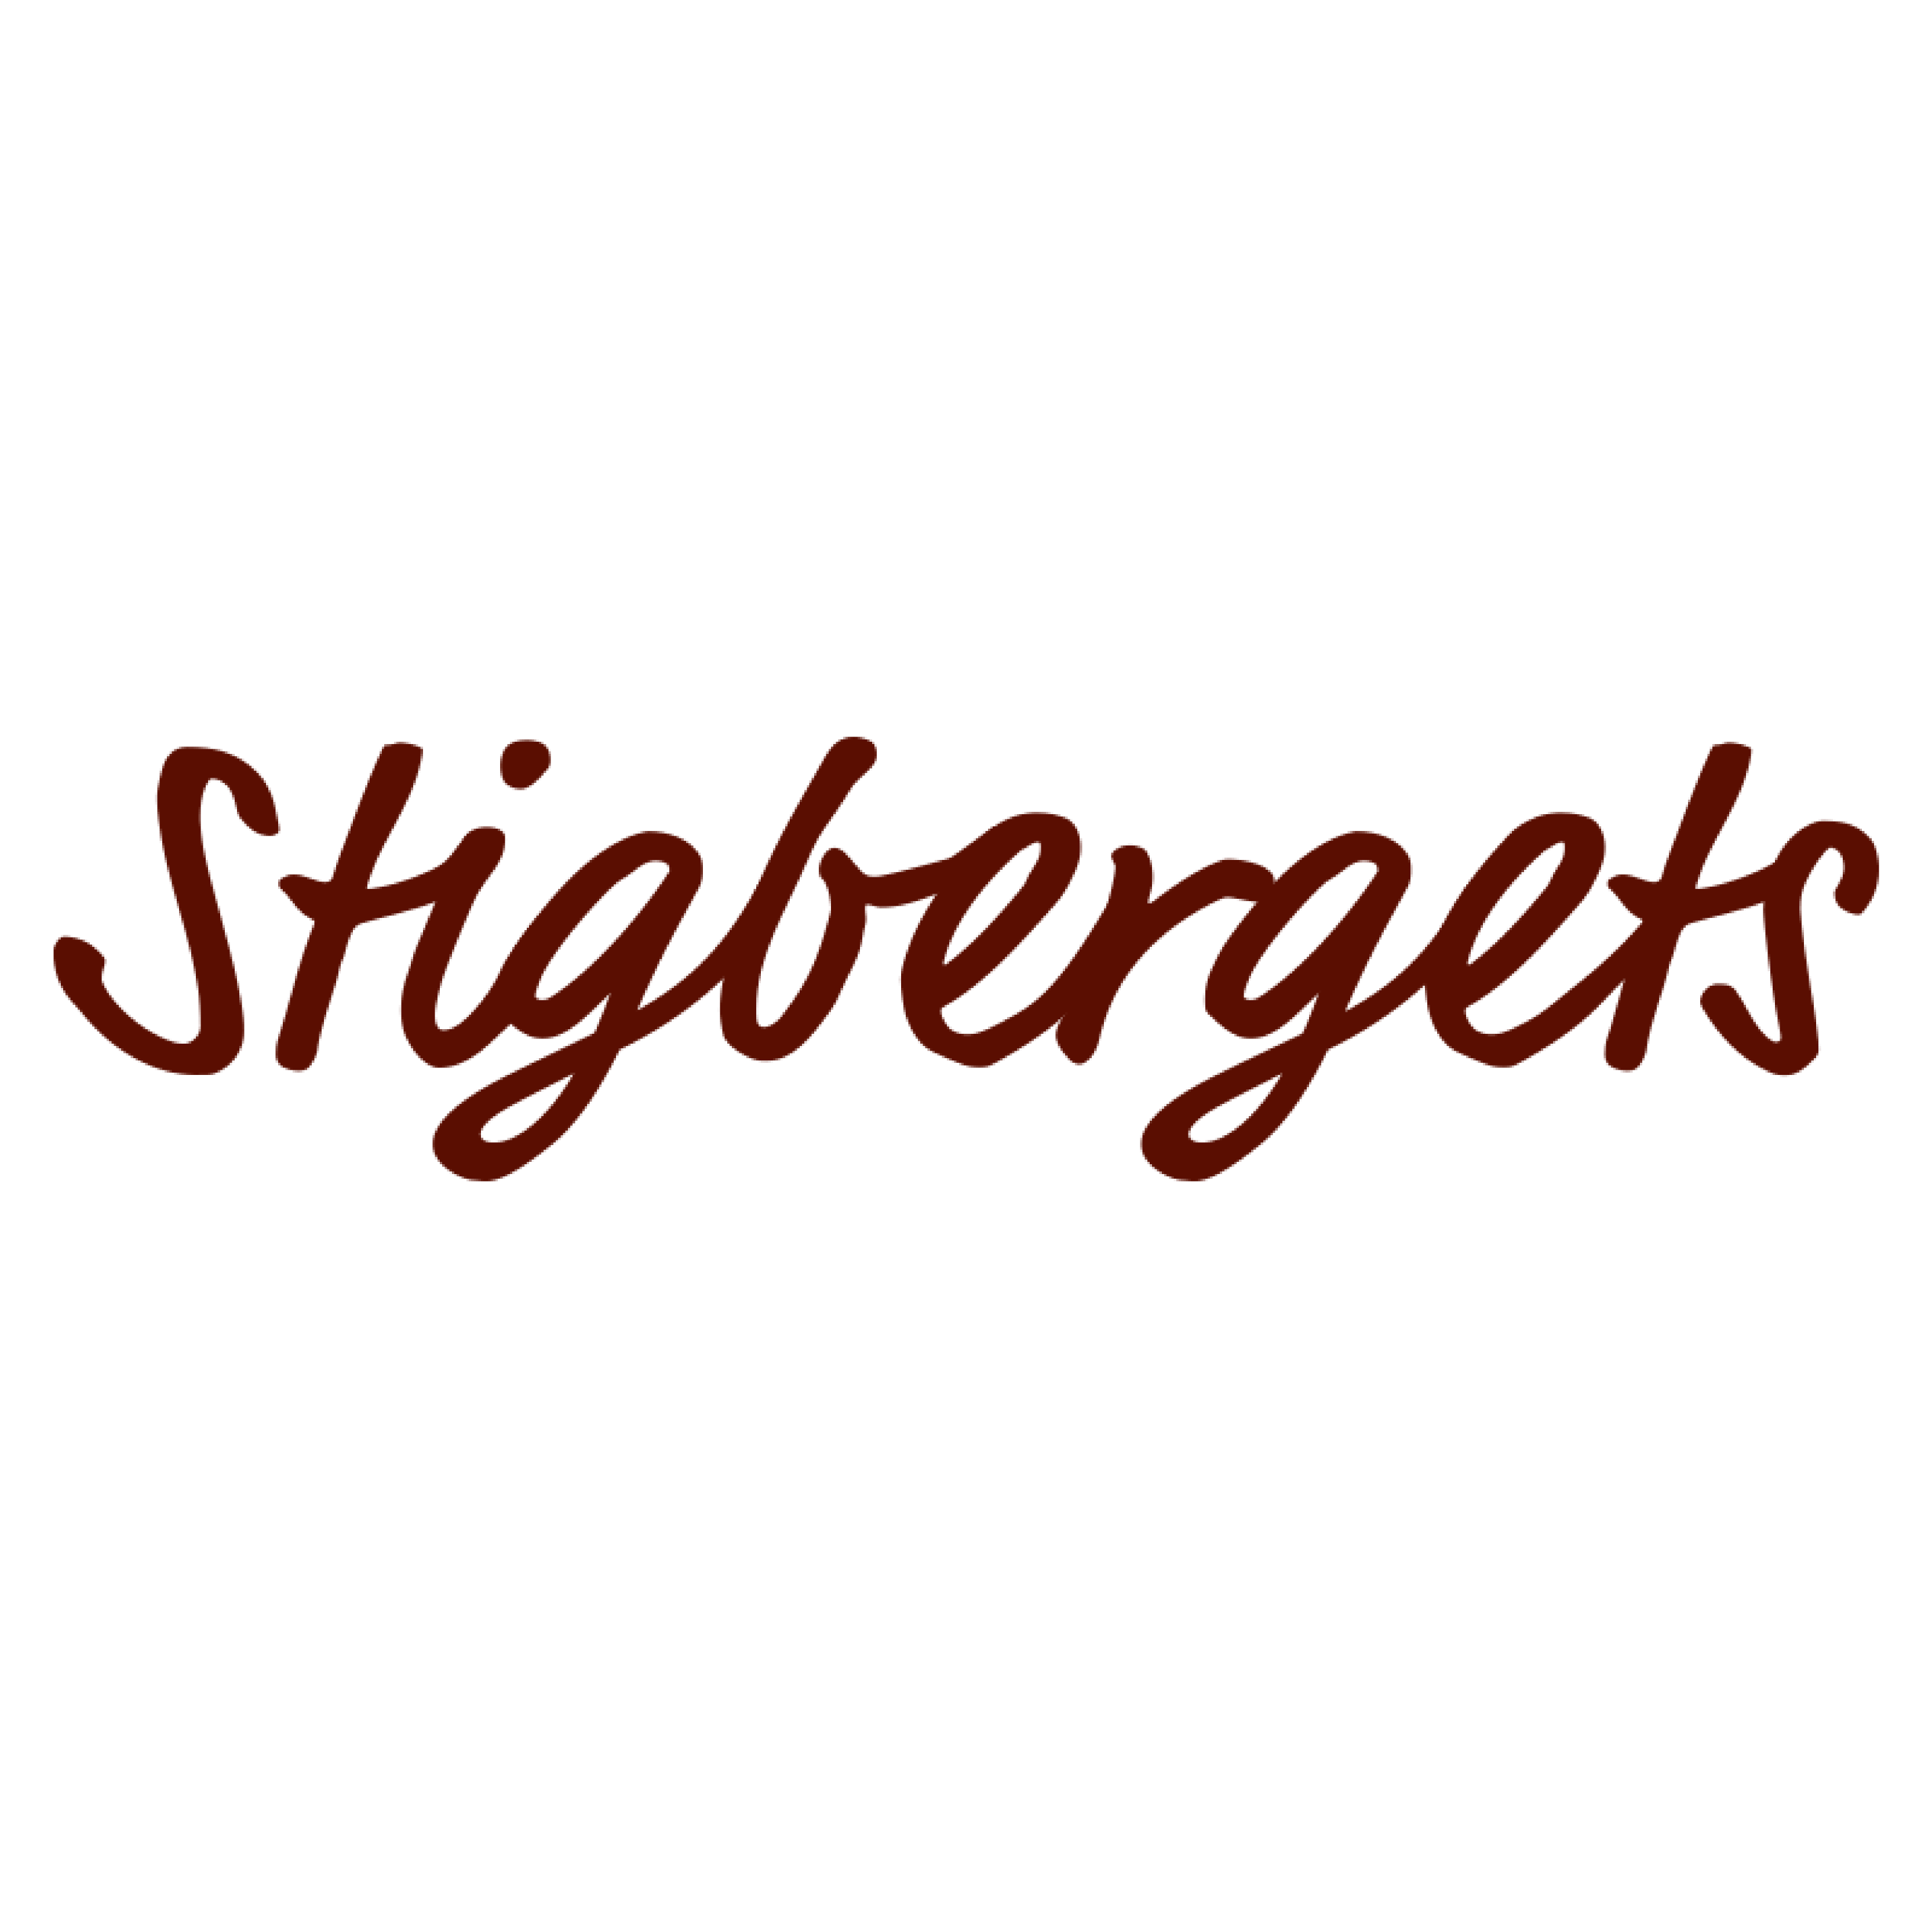 Stigbergets